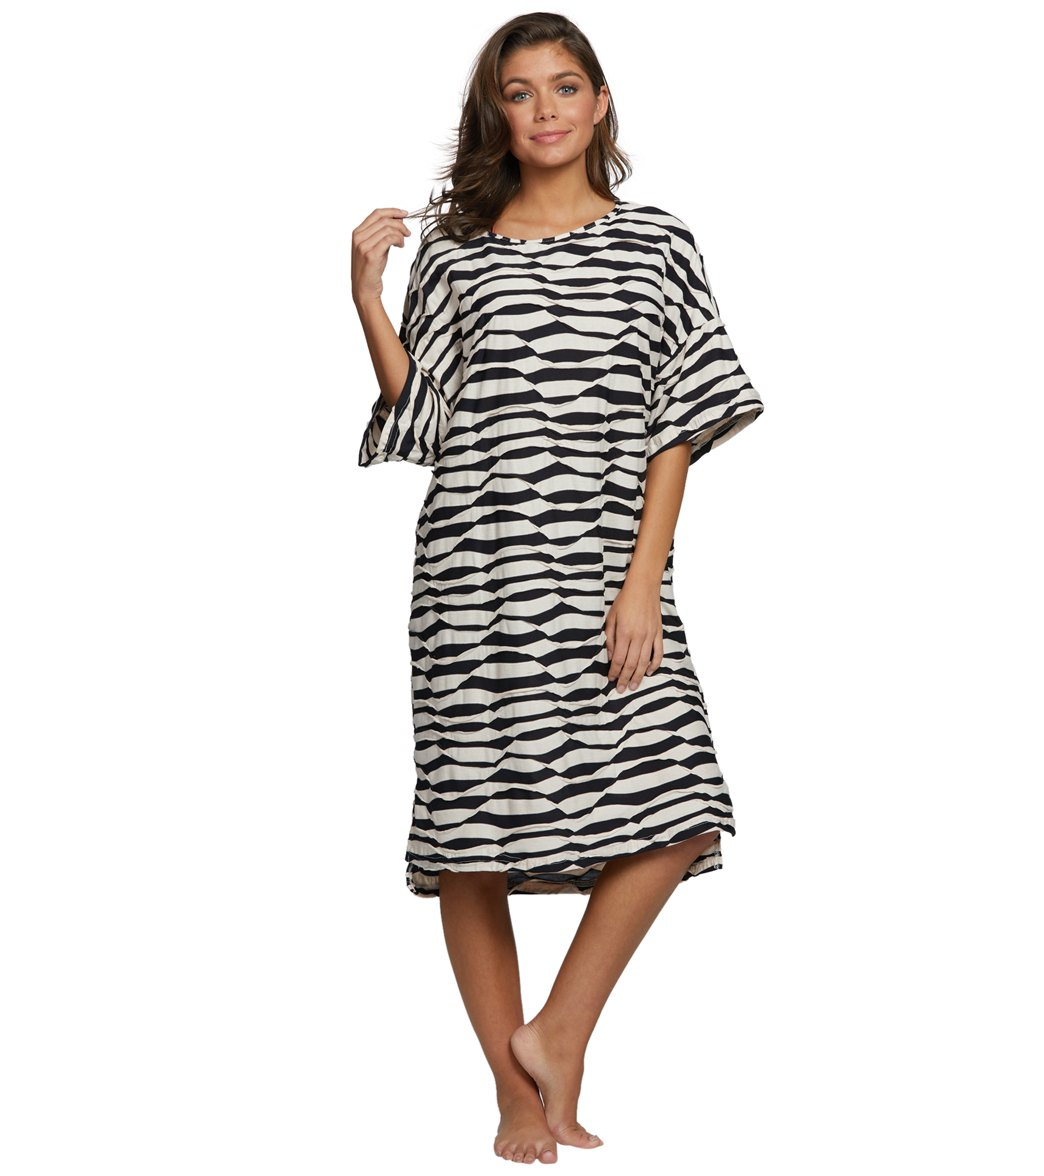 b765401b68 Seea Akemi Cover Up Dress at SwimOutlet.com - Free Shipping